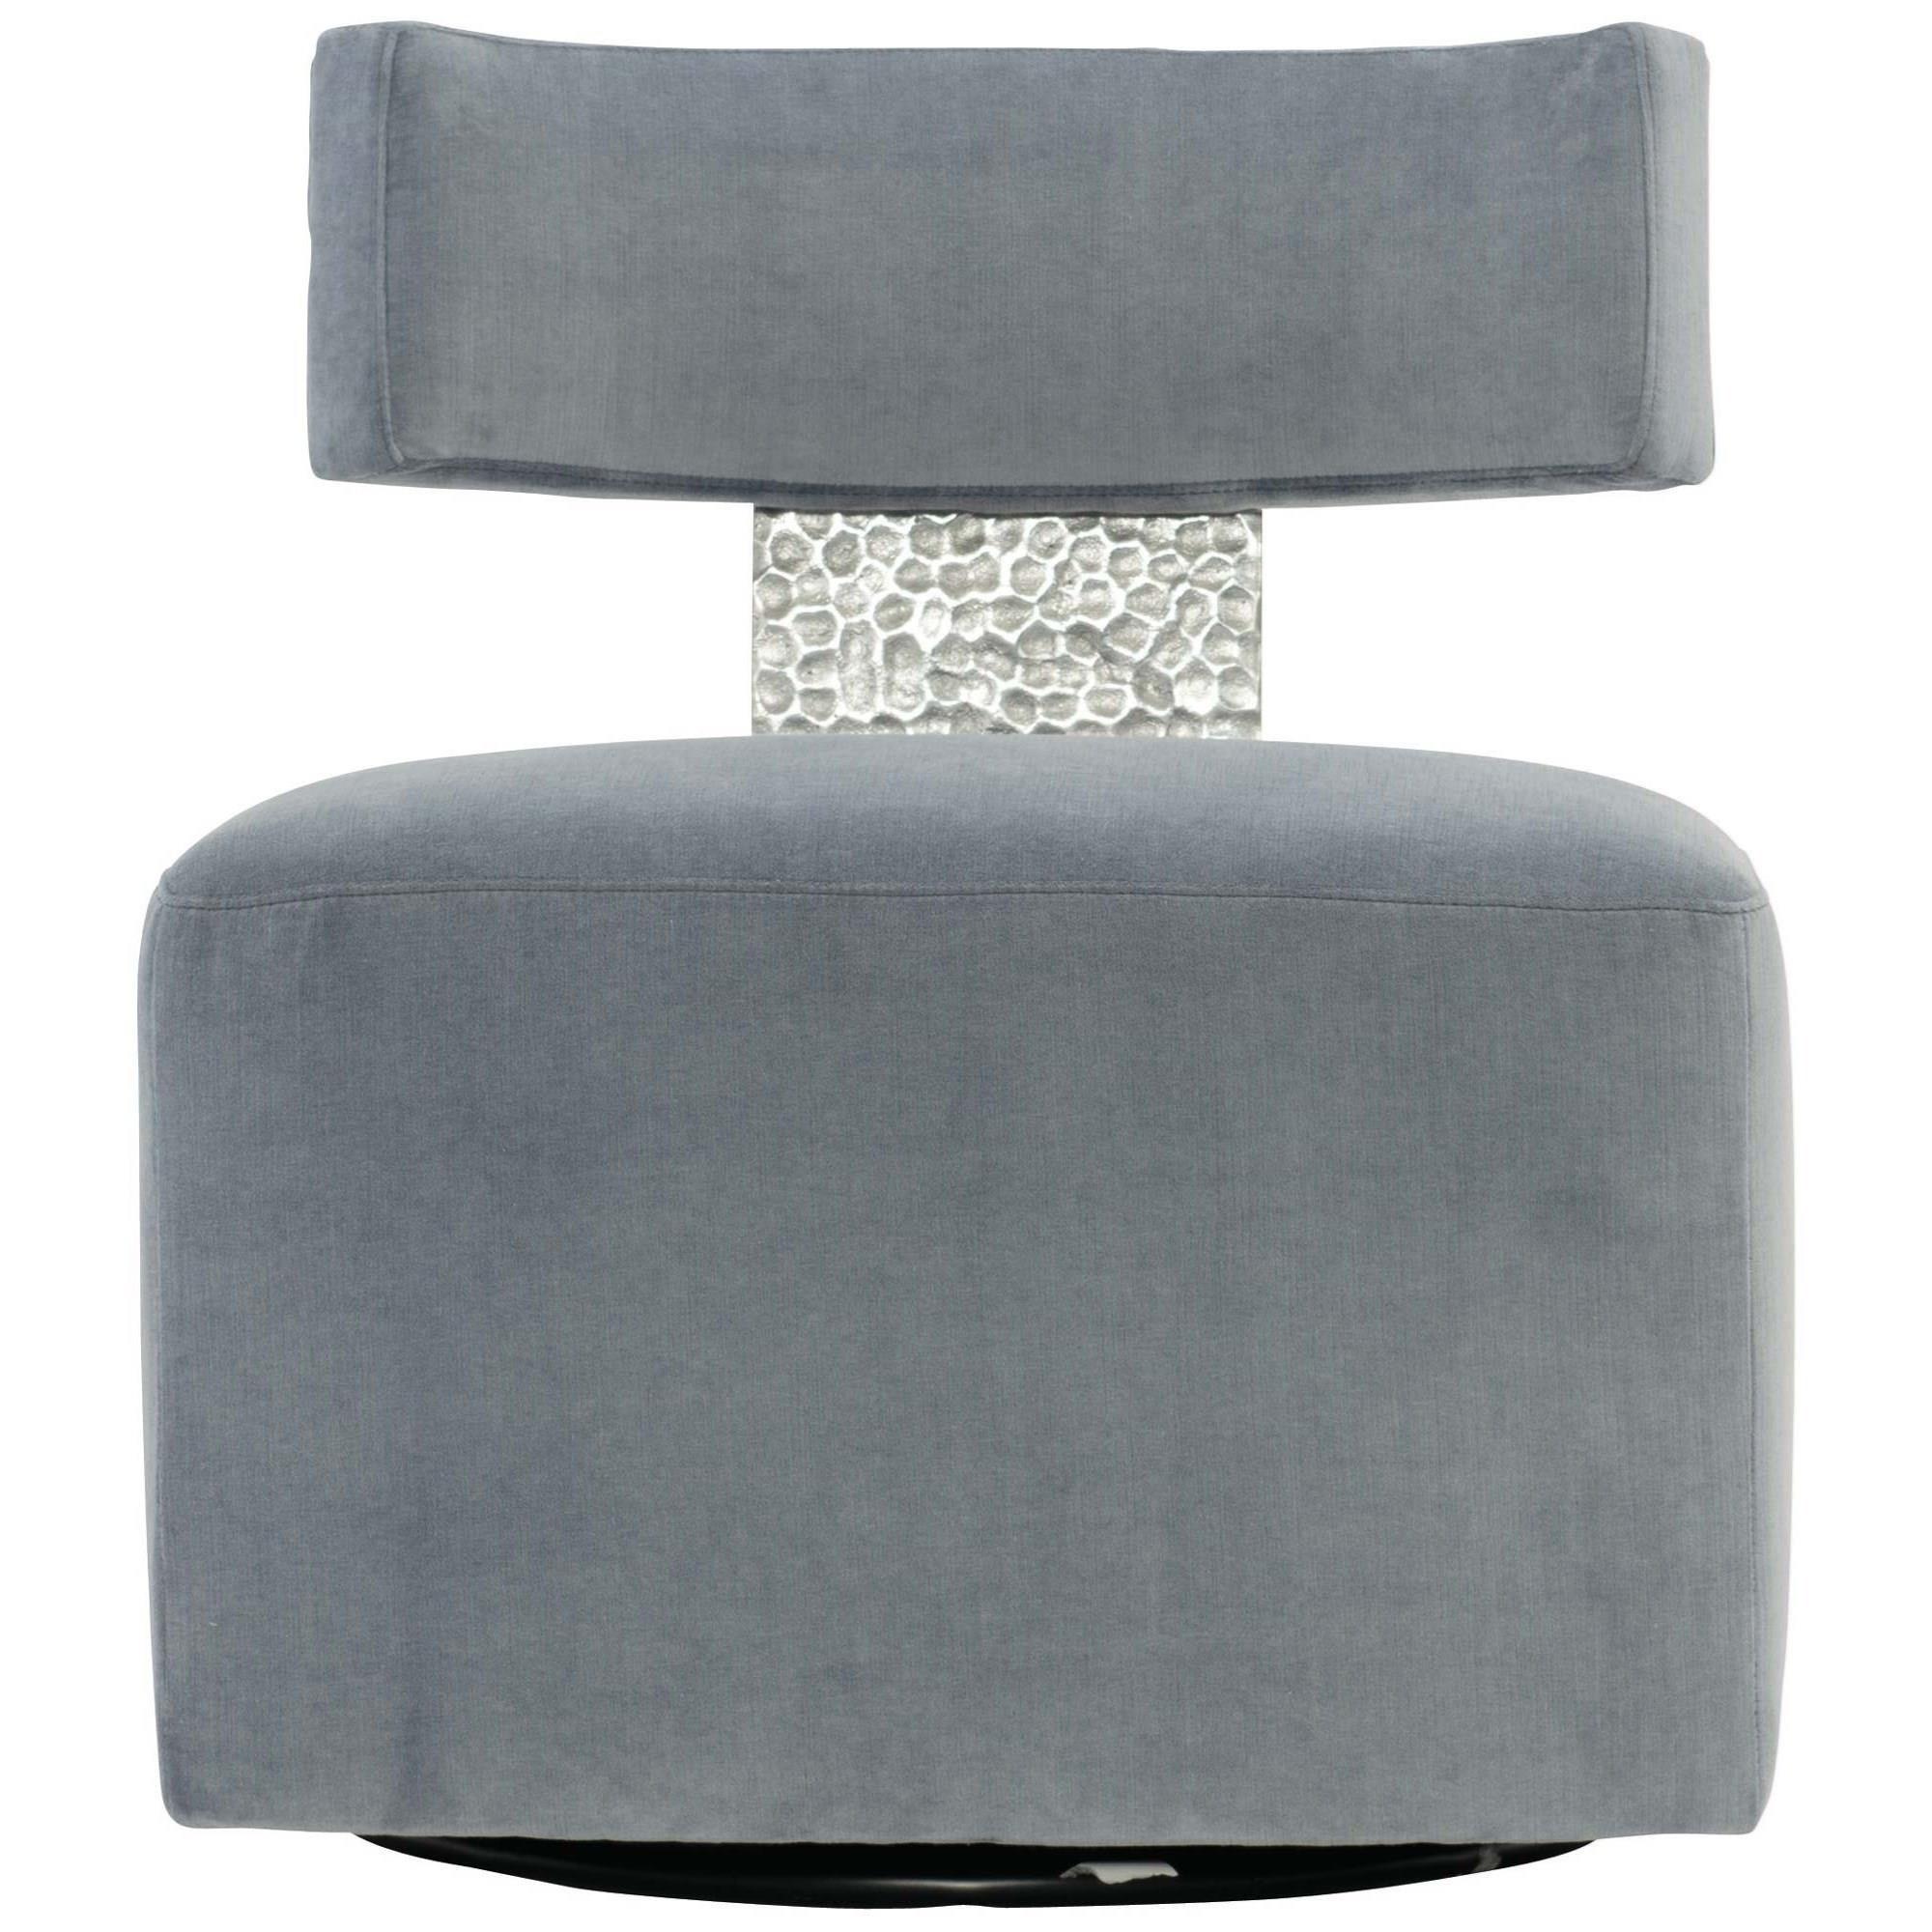 Interiors - Ella Swivel Chair at Williams & Kay